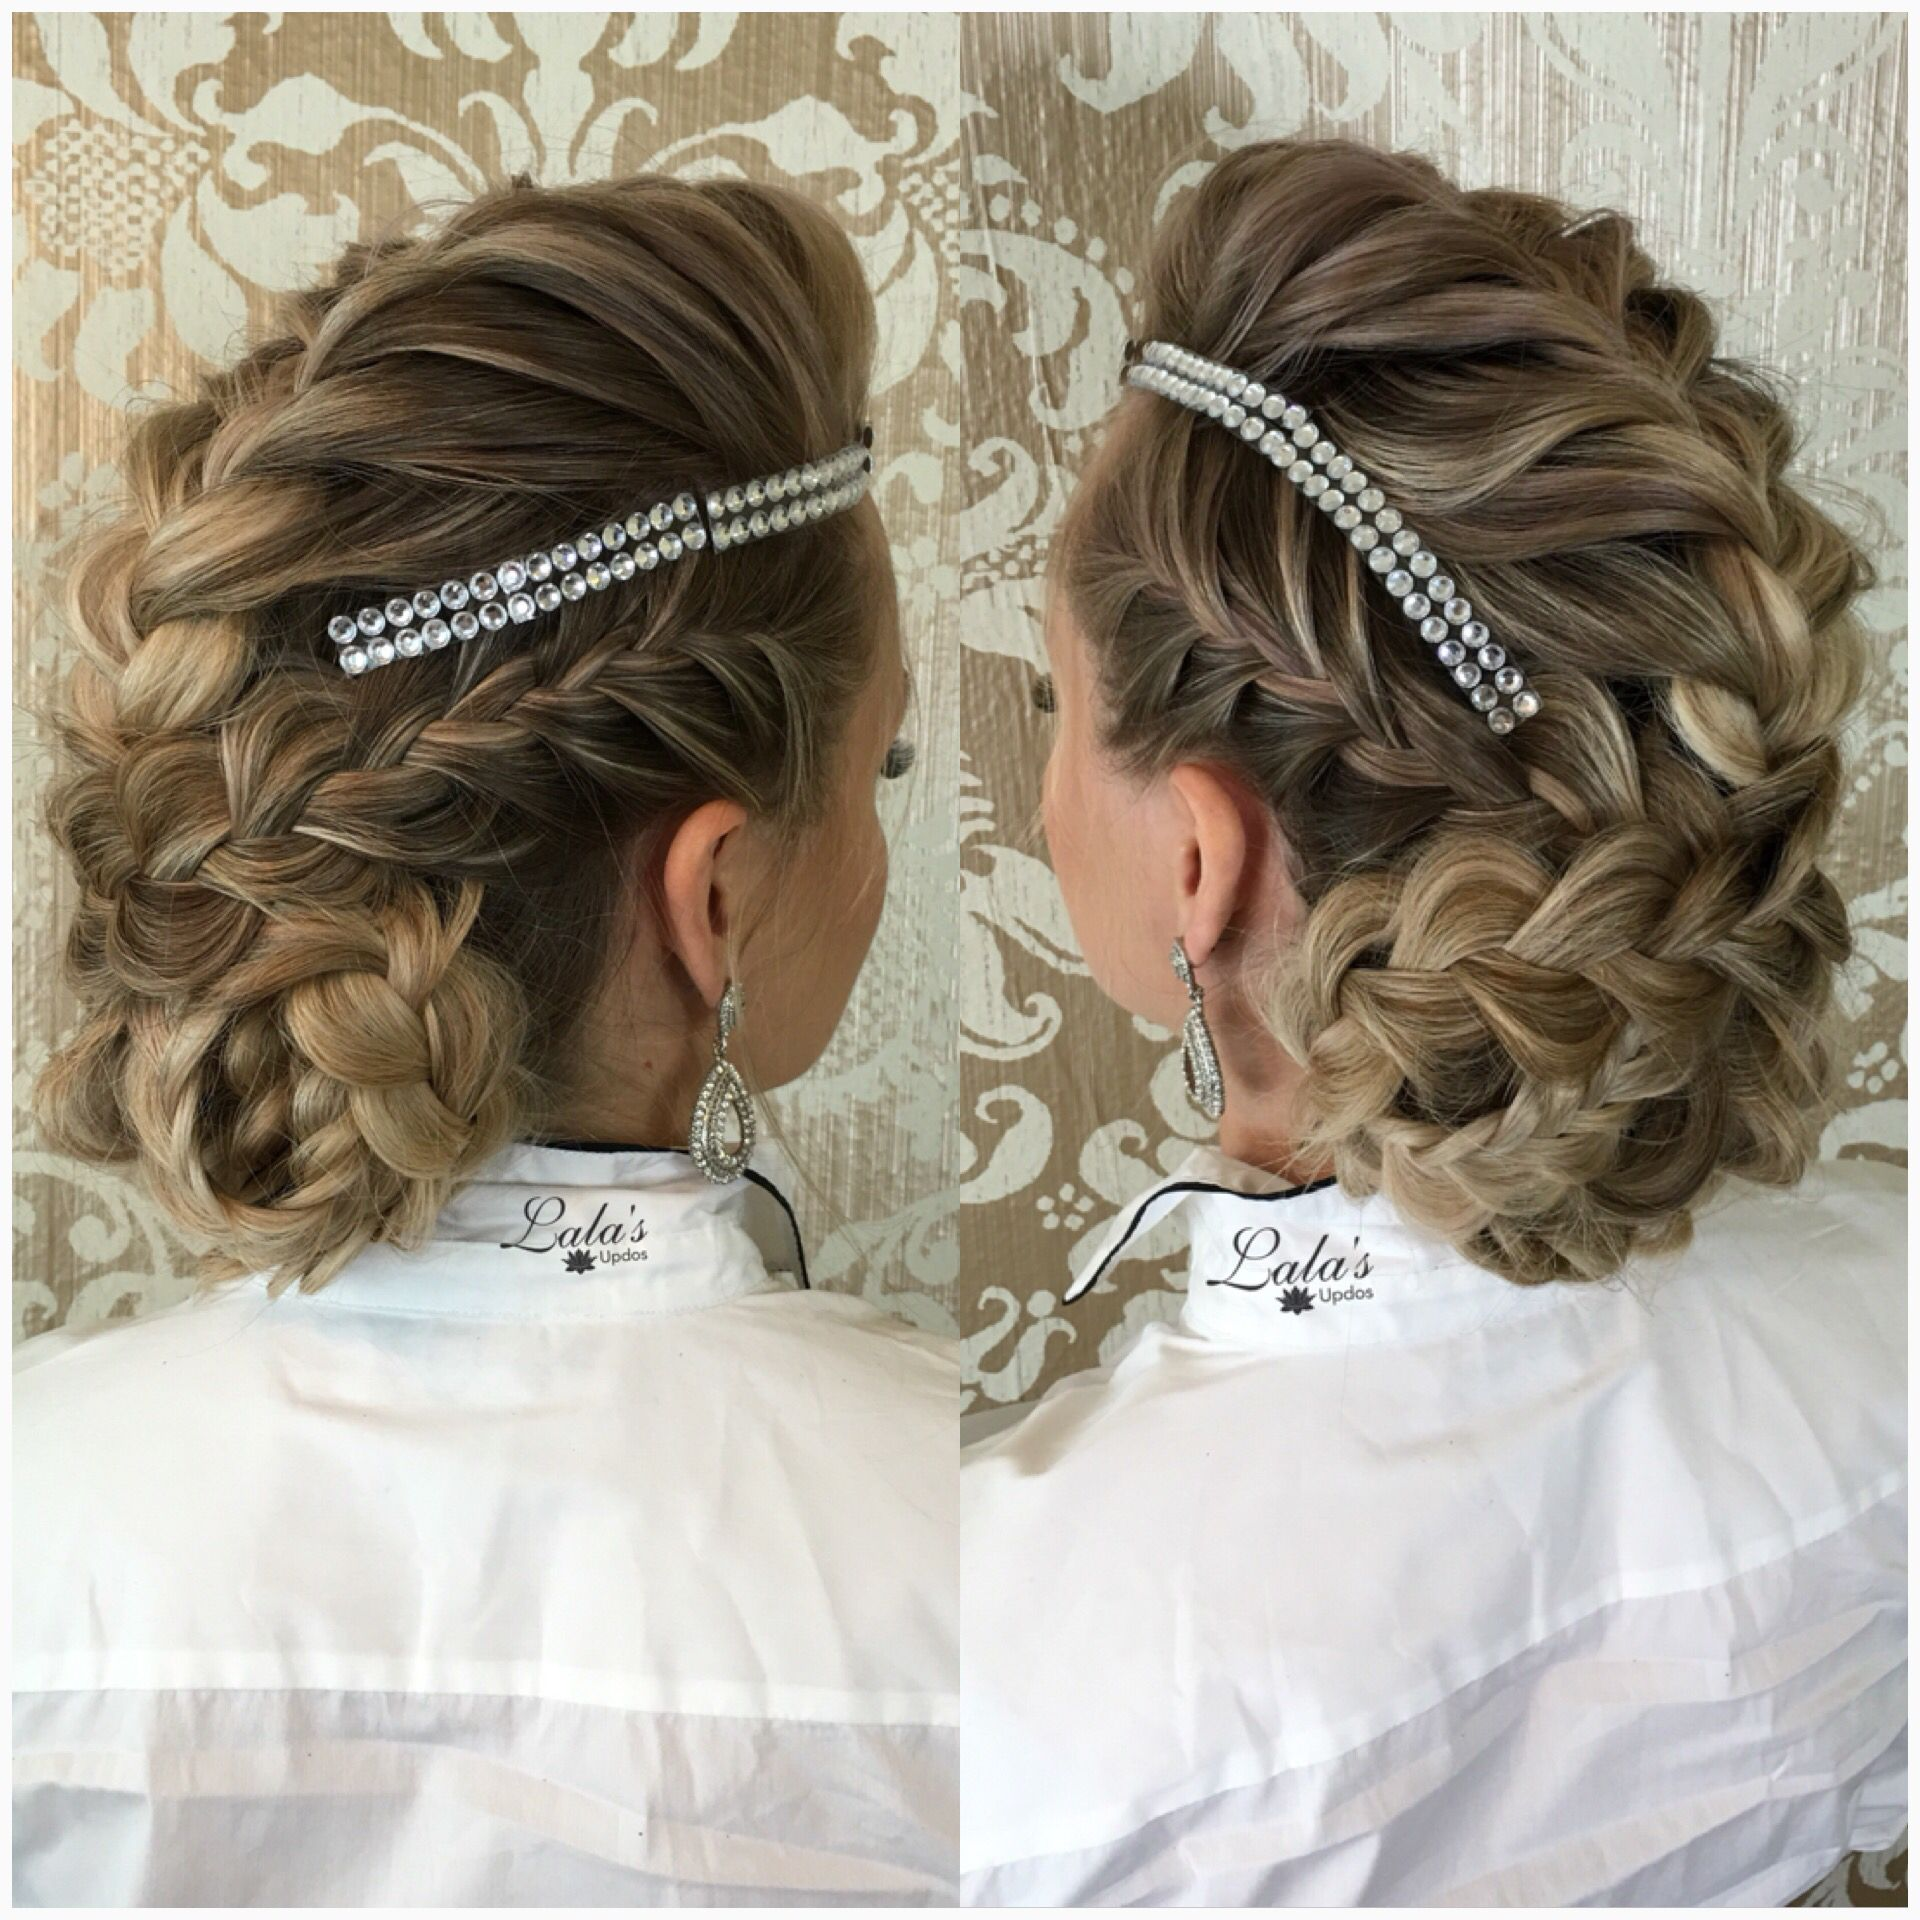 Braided mohawk updo mohawk braids updo homecoming prom